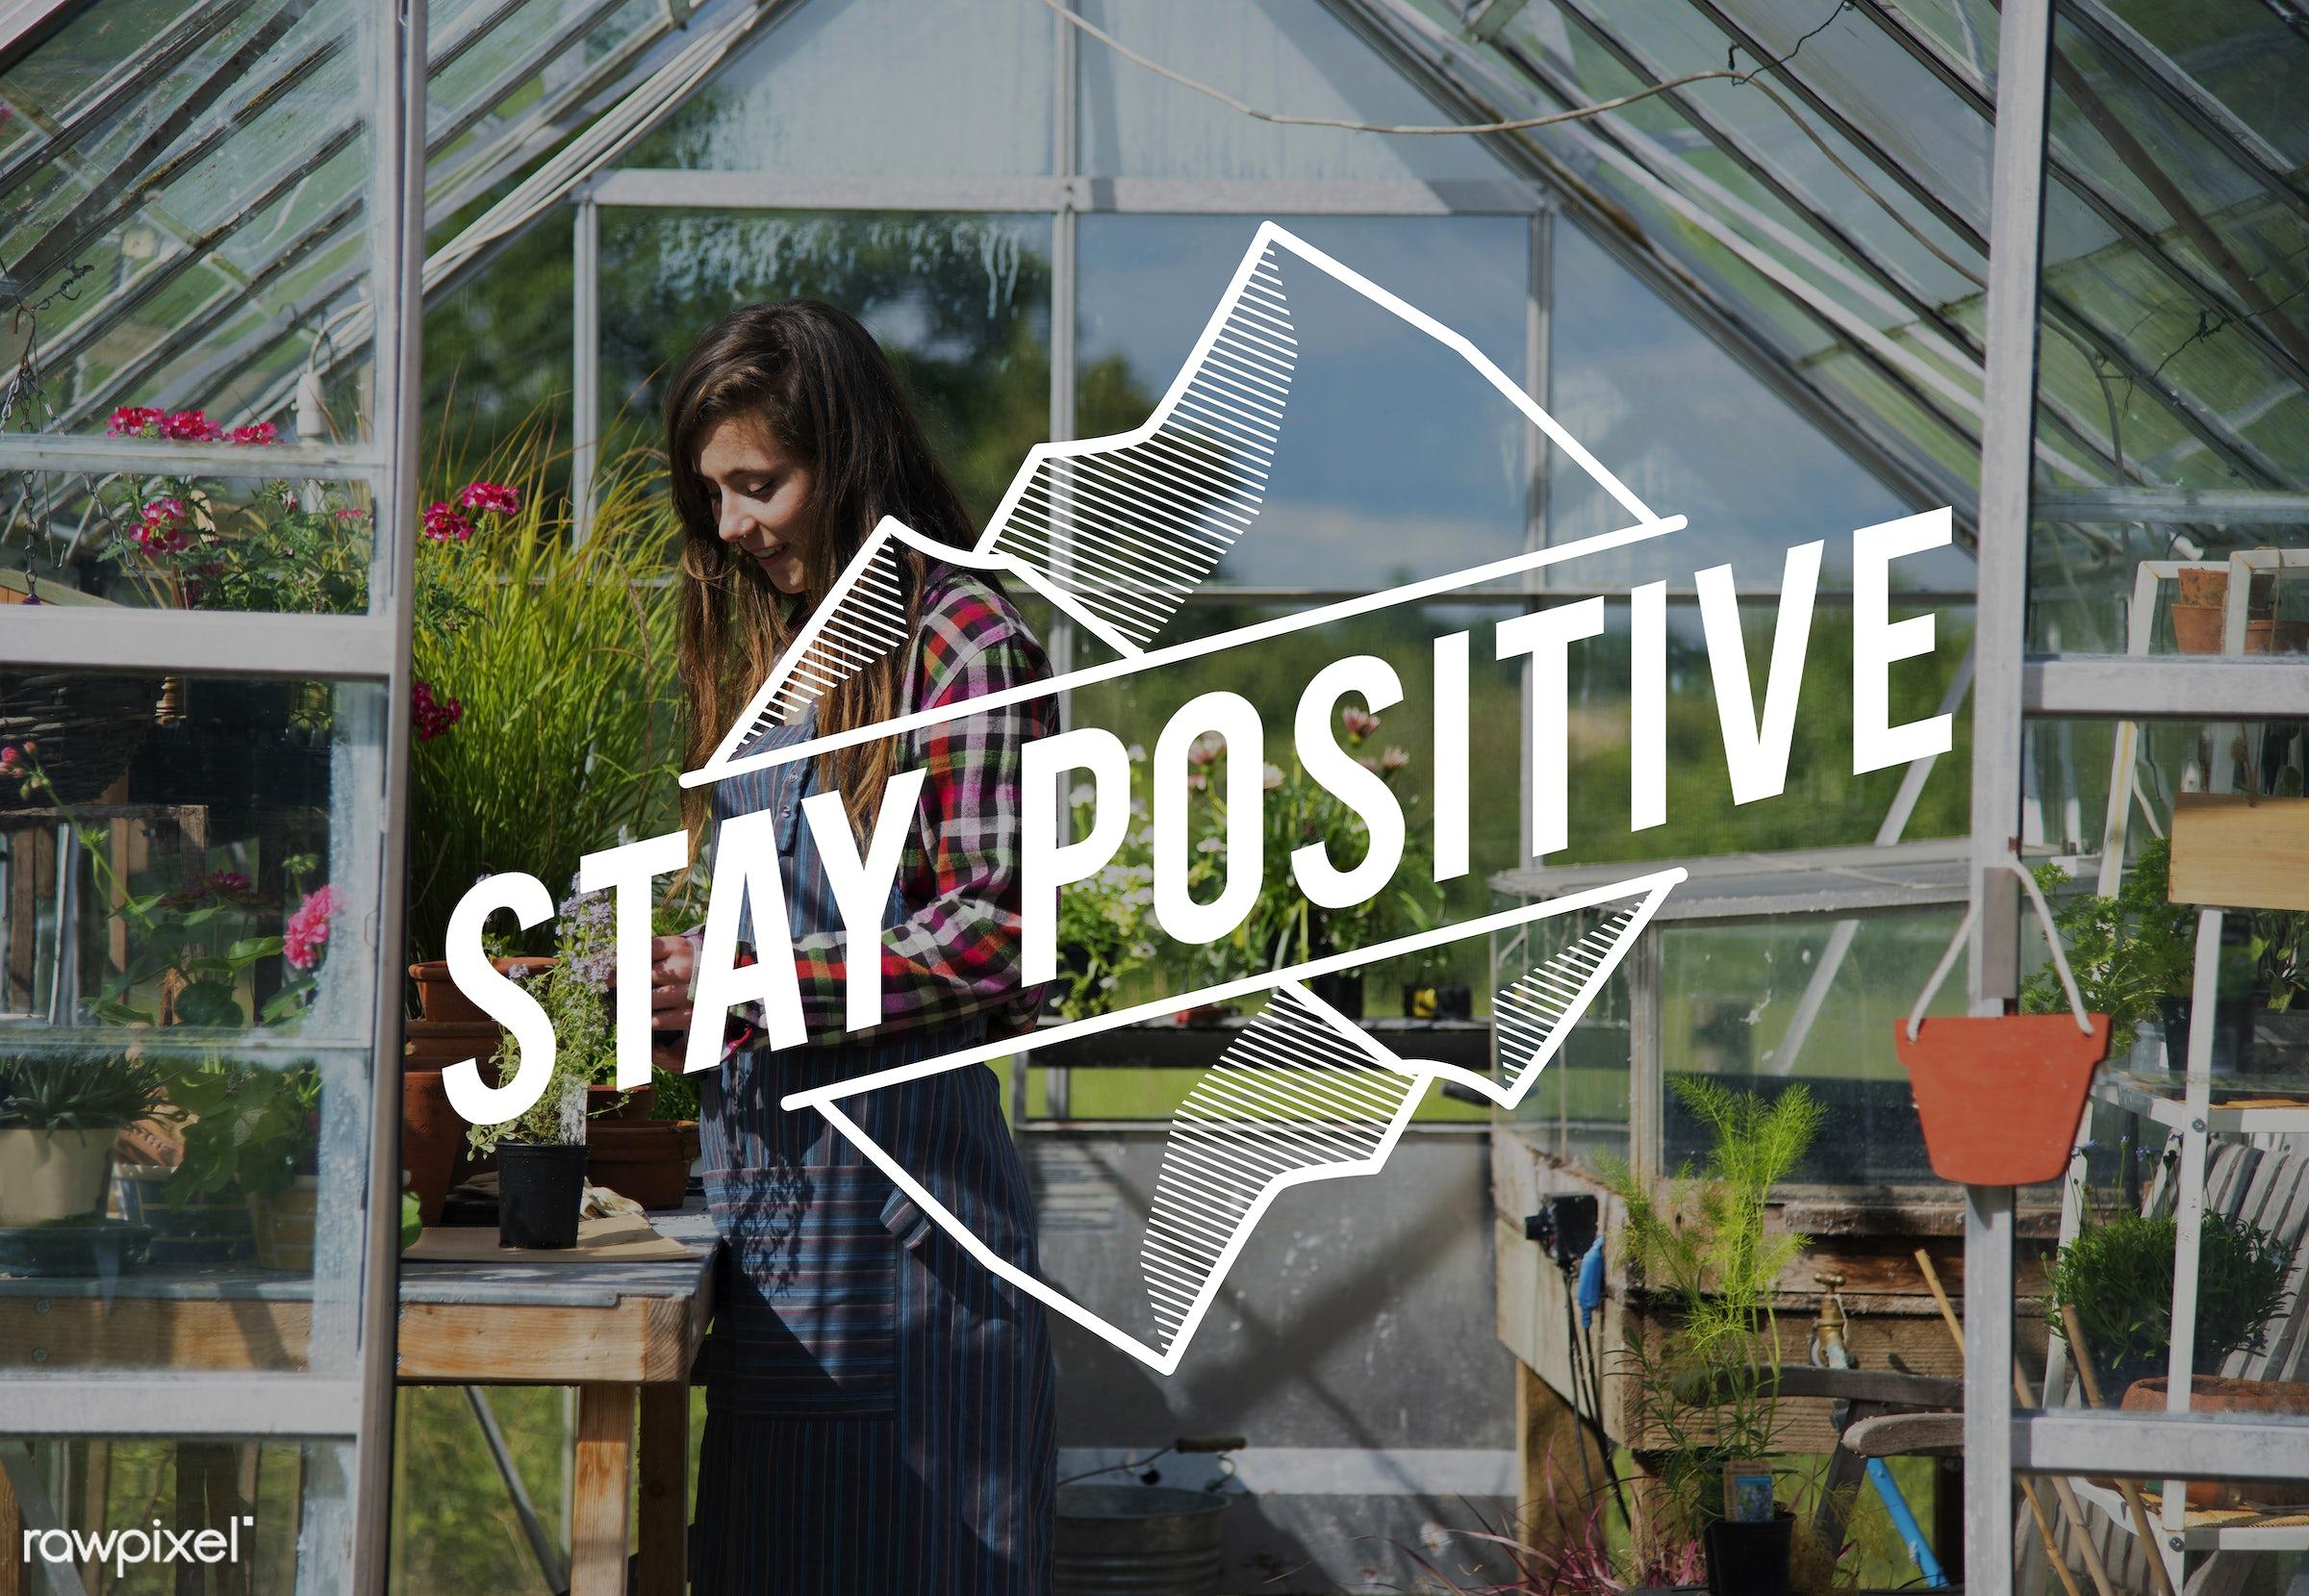 apron, be positive, better, caucasian, dark blonde, day, delightful, enjoy, enjoyment, female, flowers, garden, gardener,...